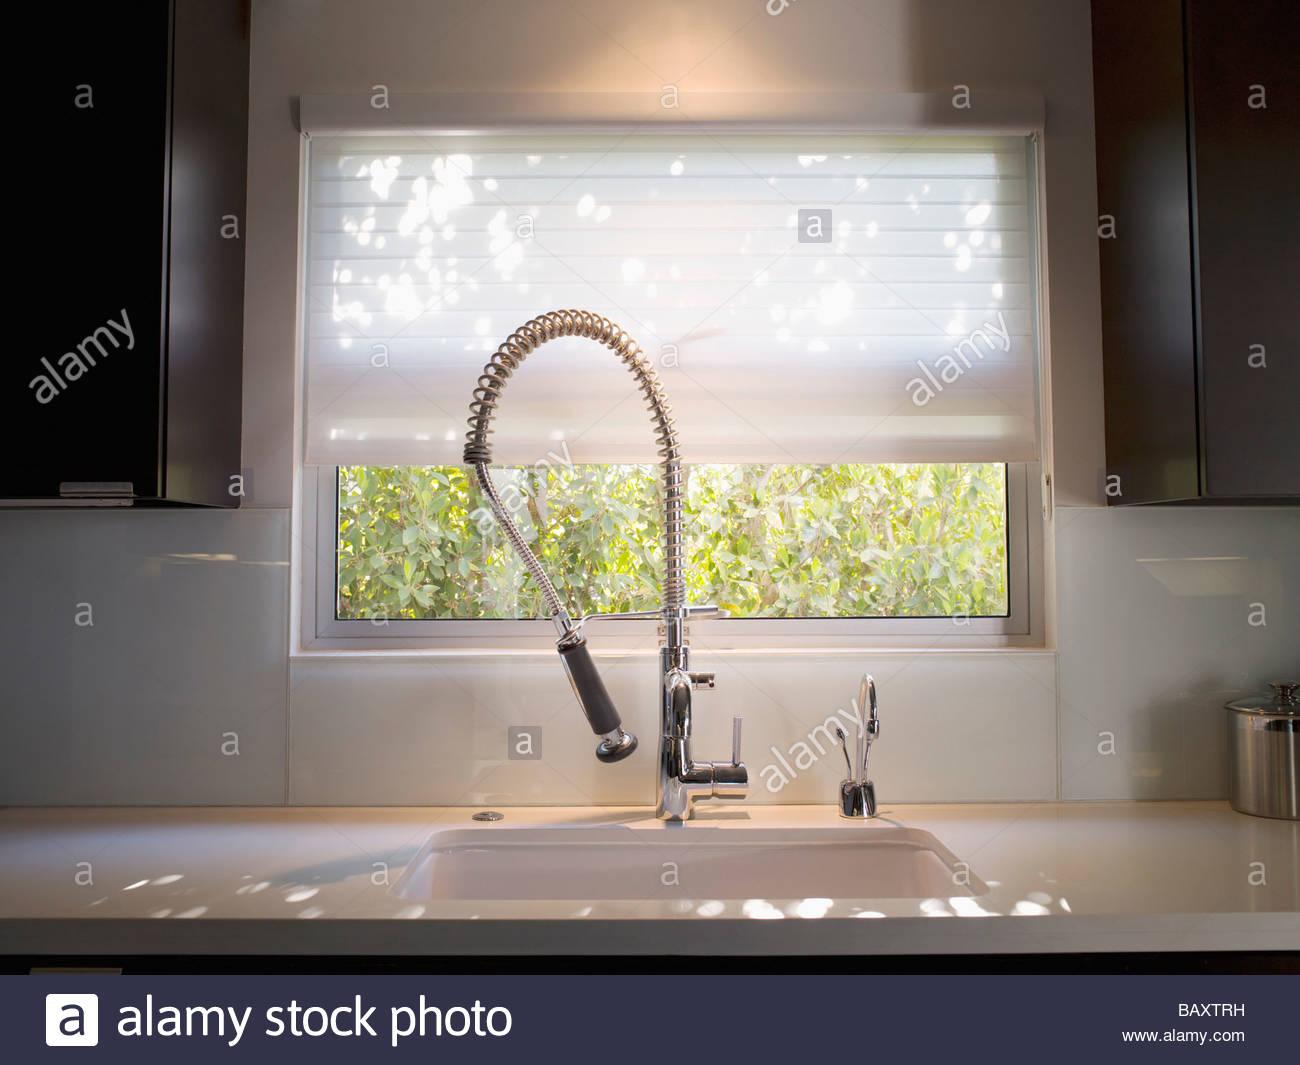 Interior Of Modern Kitchen And Spray Nozzle